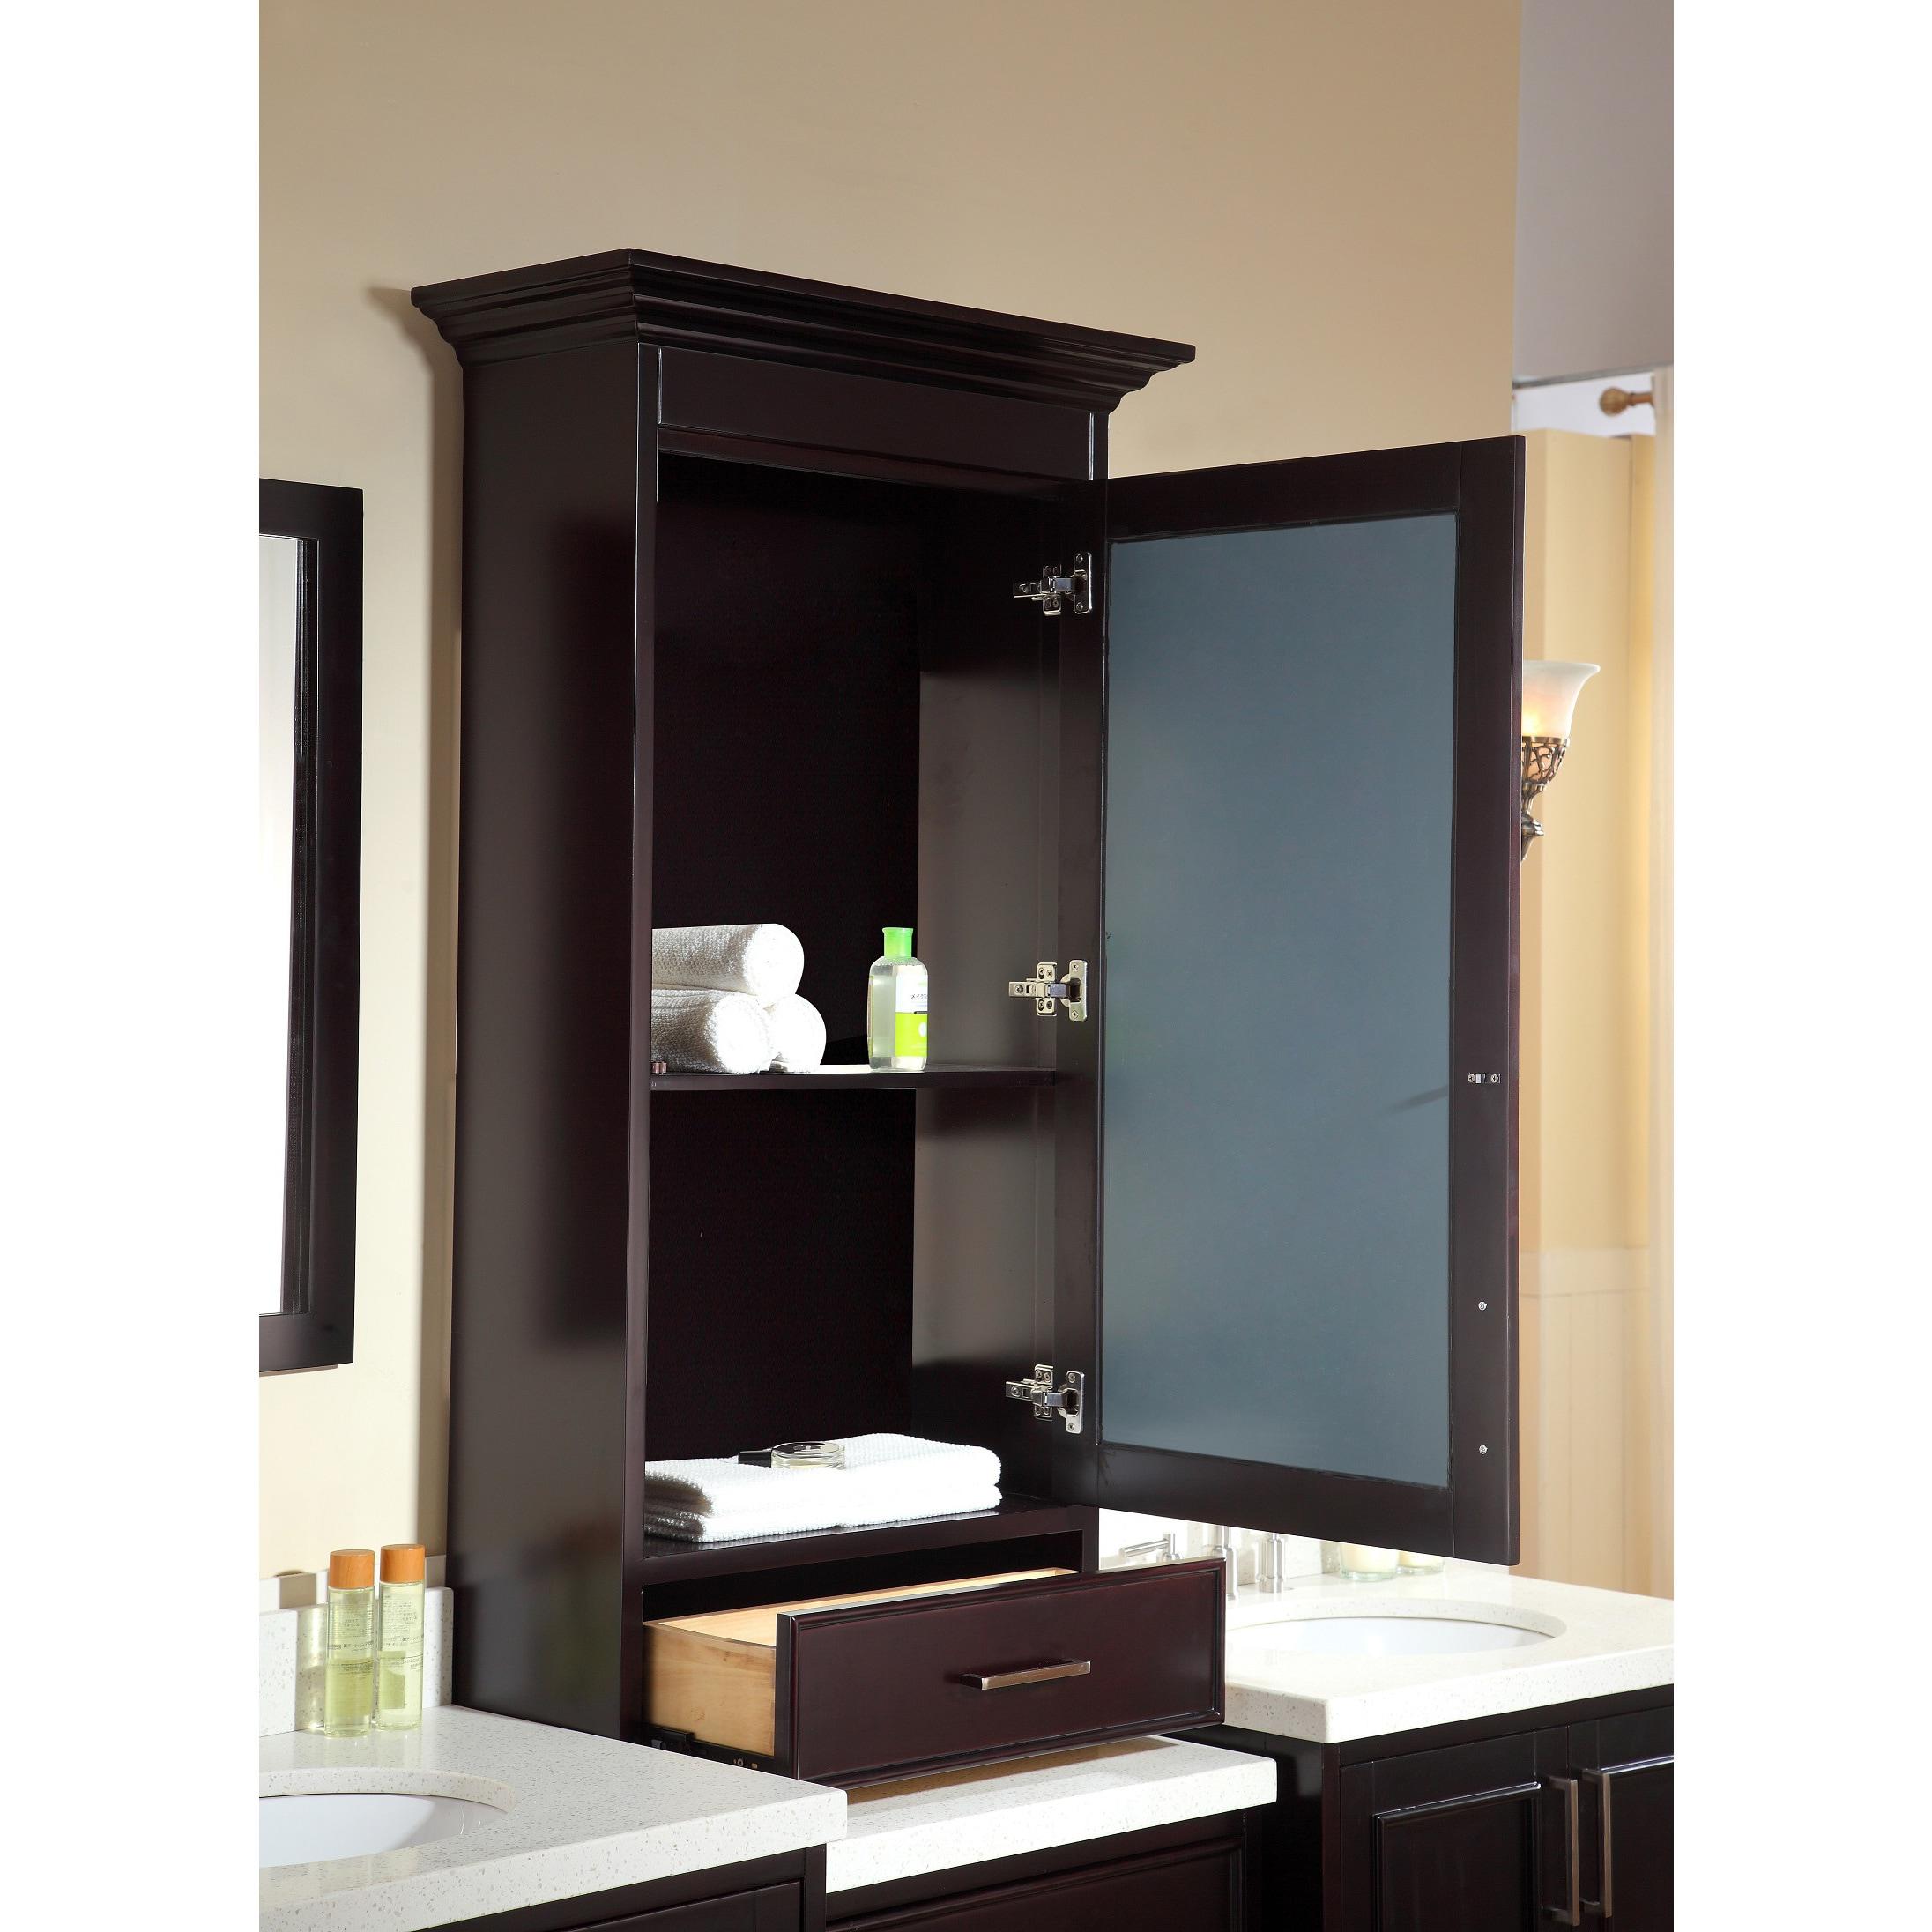 ARIEL Stafford 85 inch Double Sink Espresso Vanity Set with Center